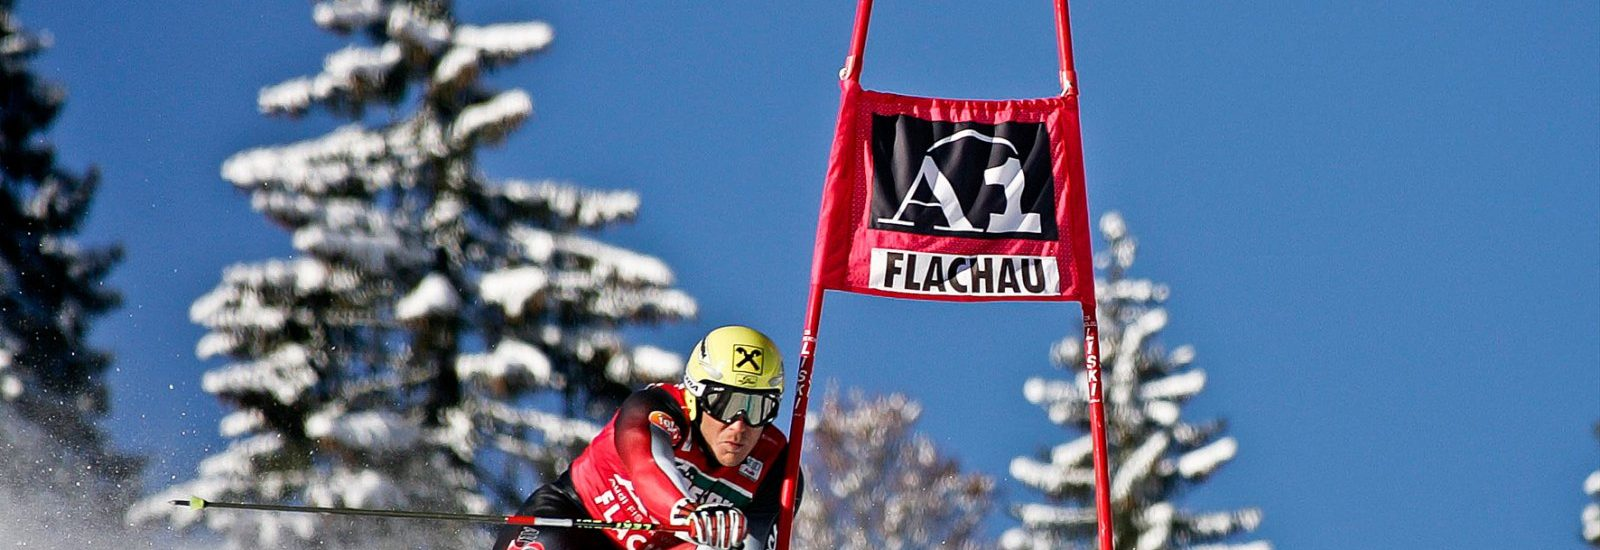 Hermann Maier beim Weltcup Flachau 2004